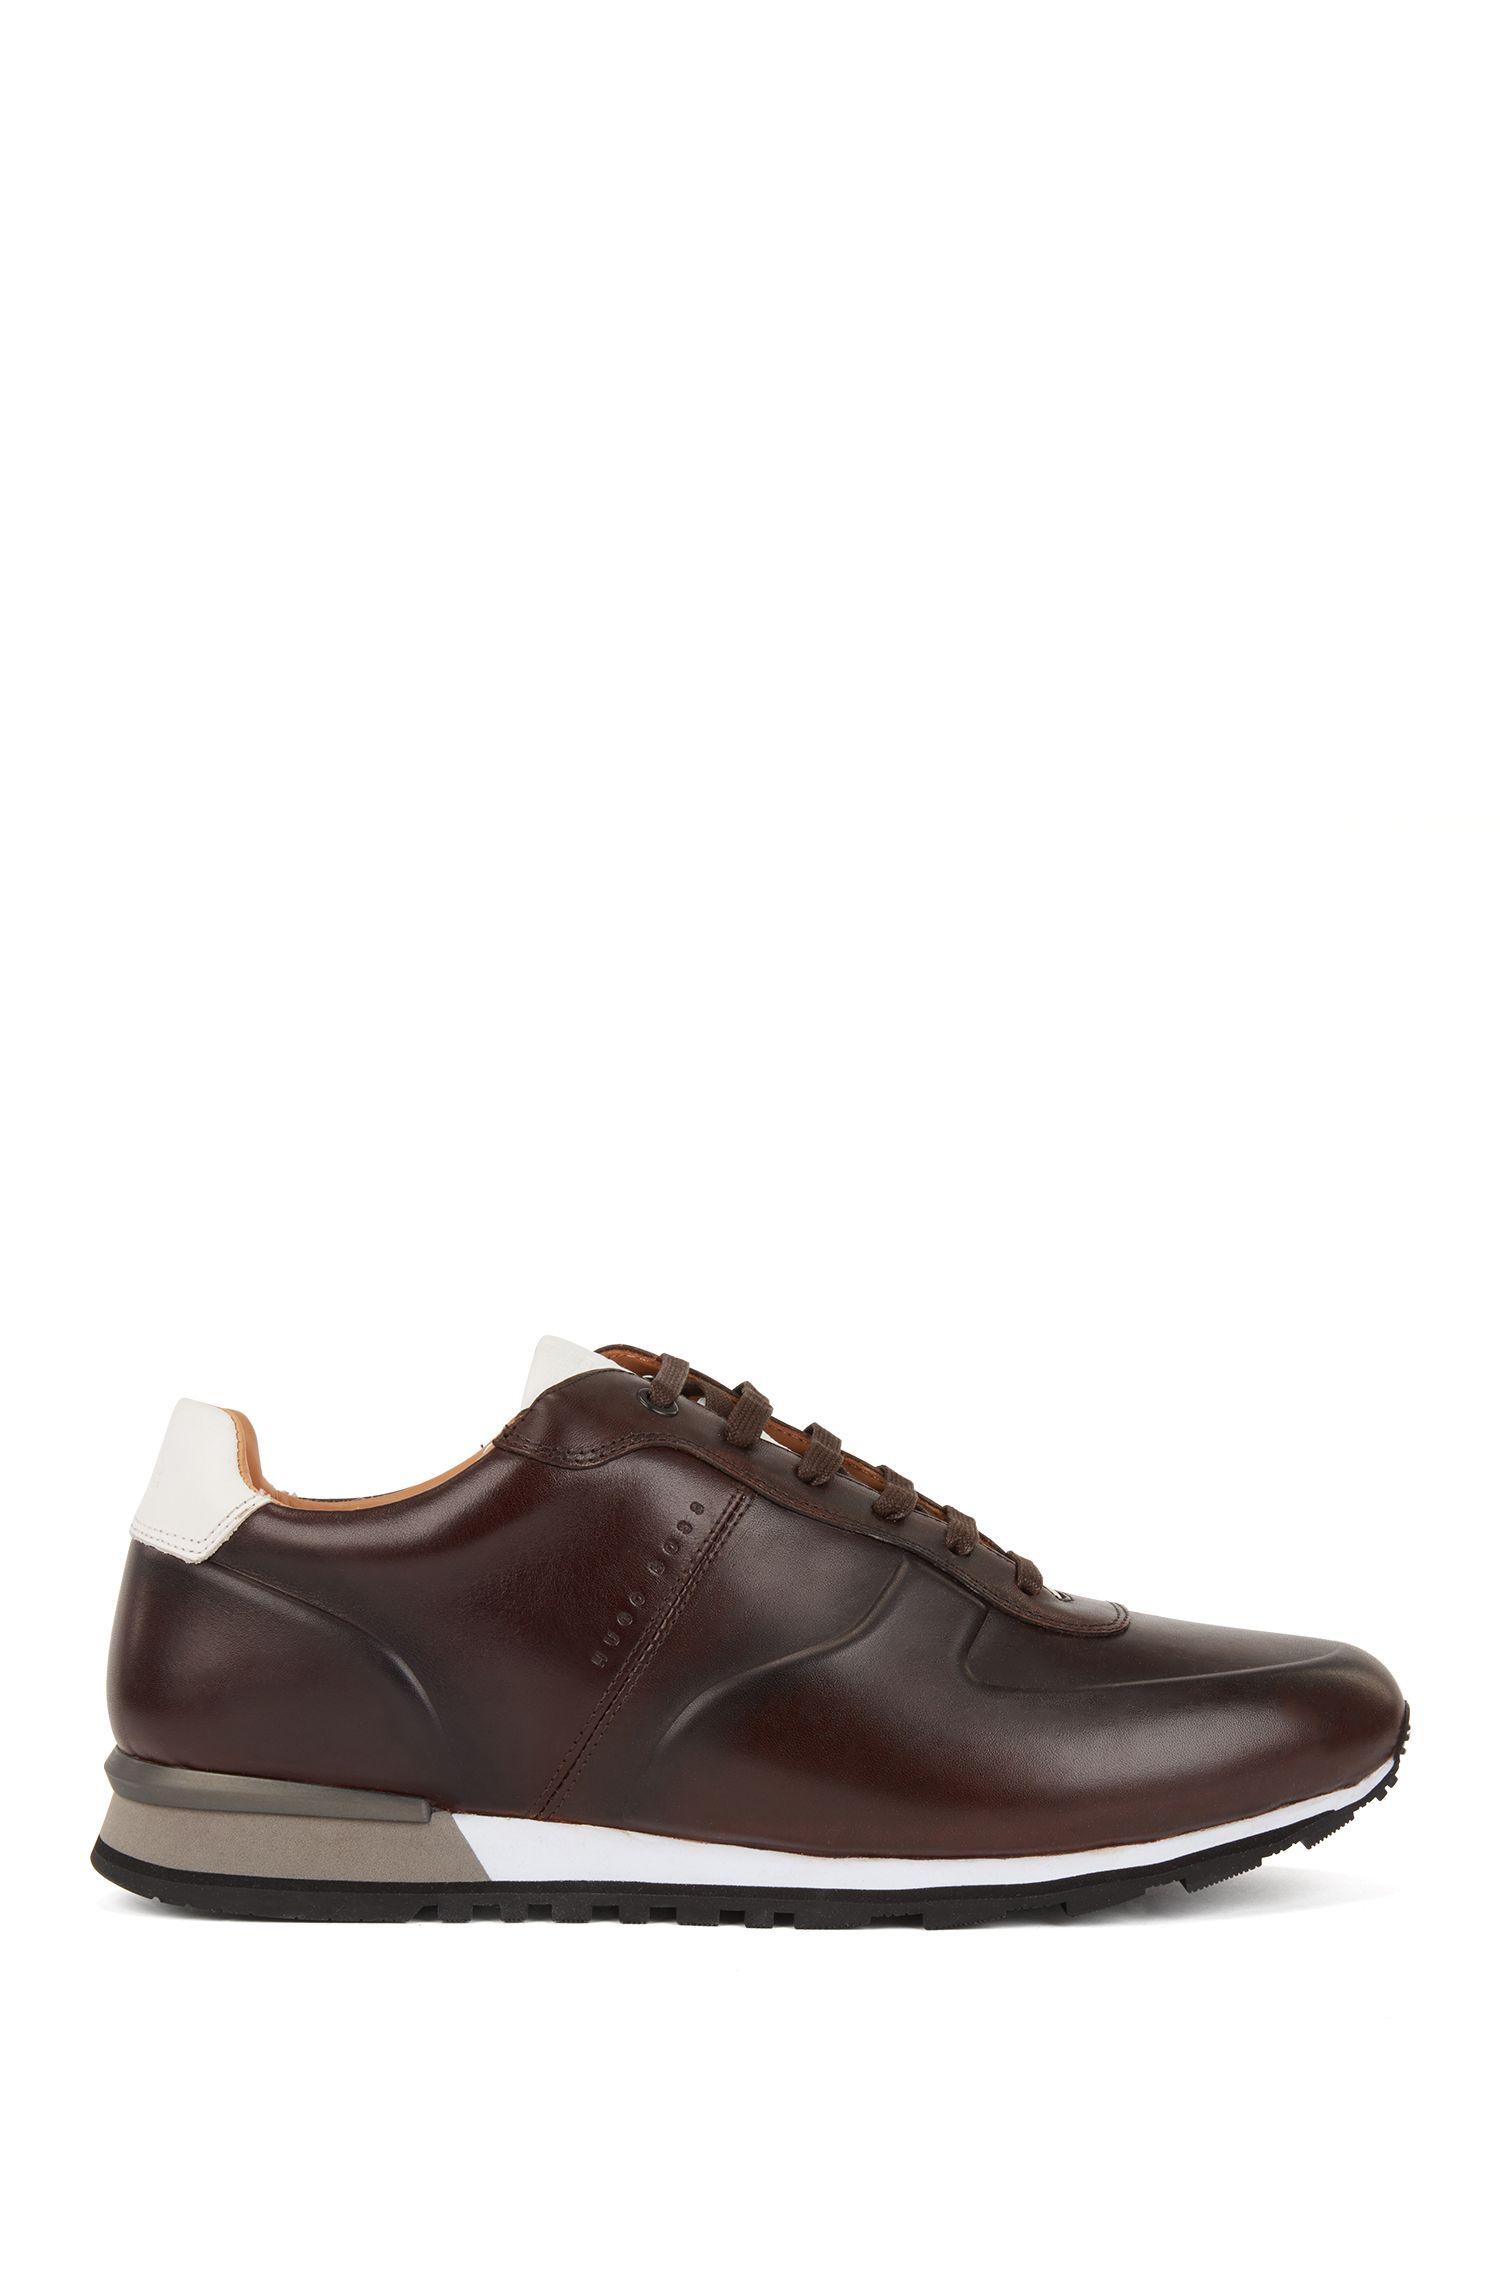 Sneakers stile runner in pelle di vitello brunita